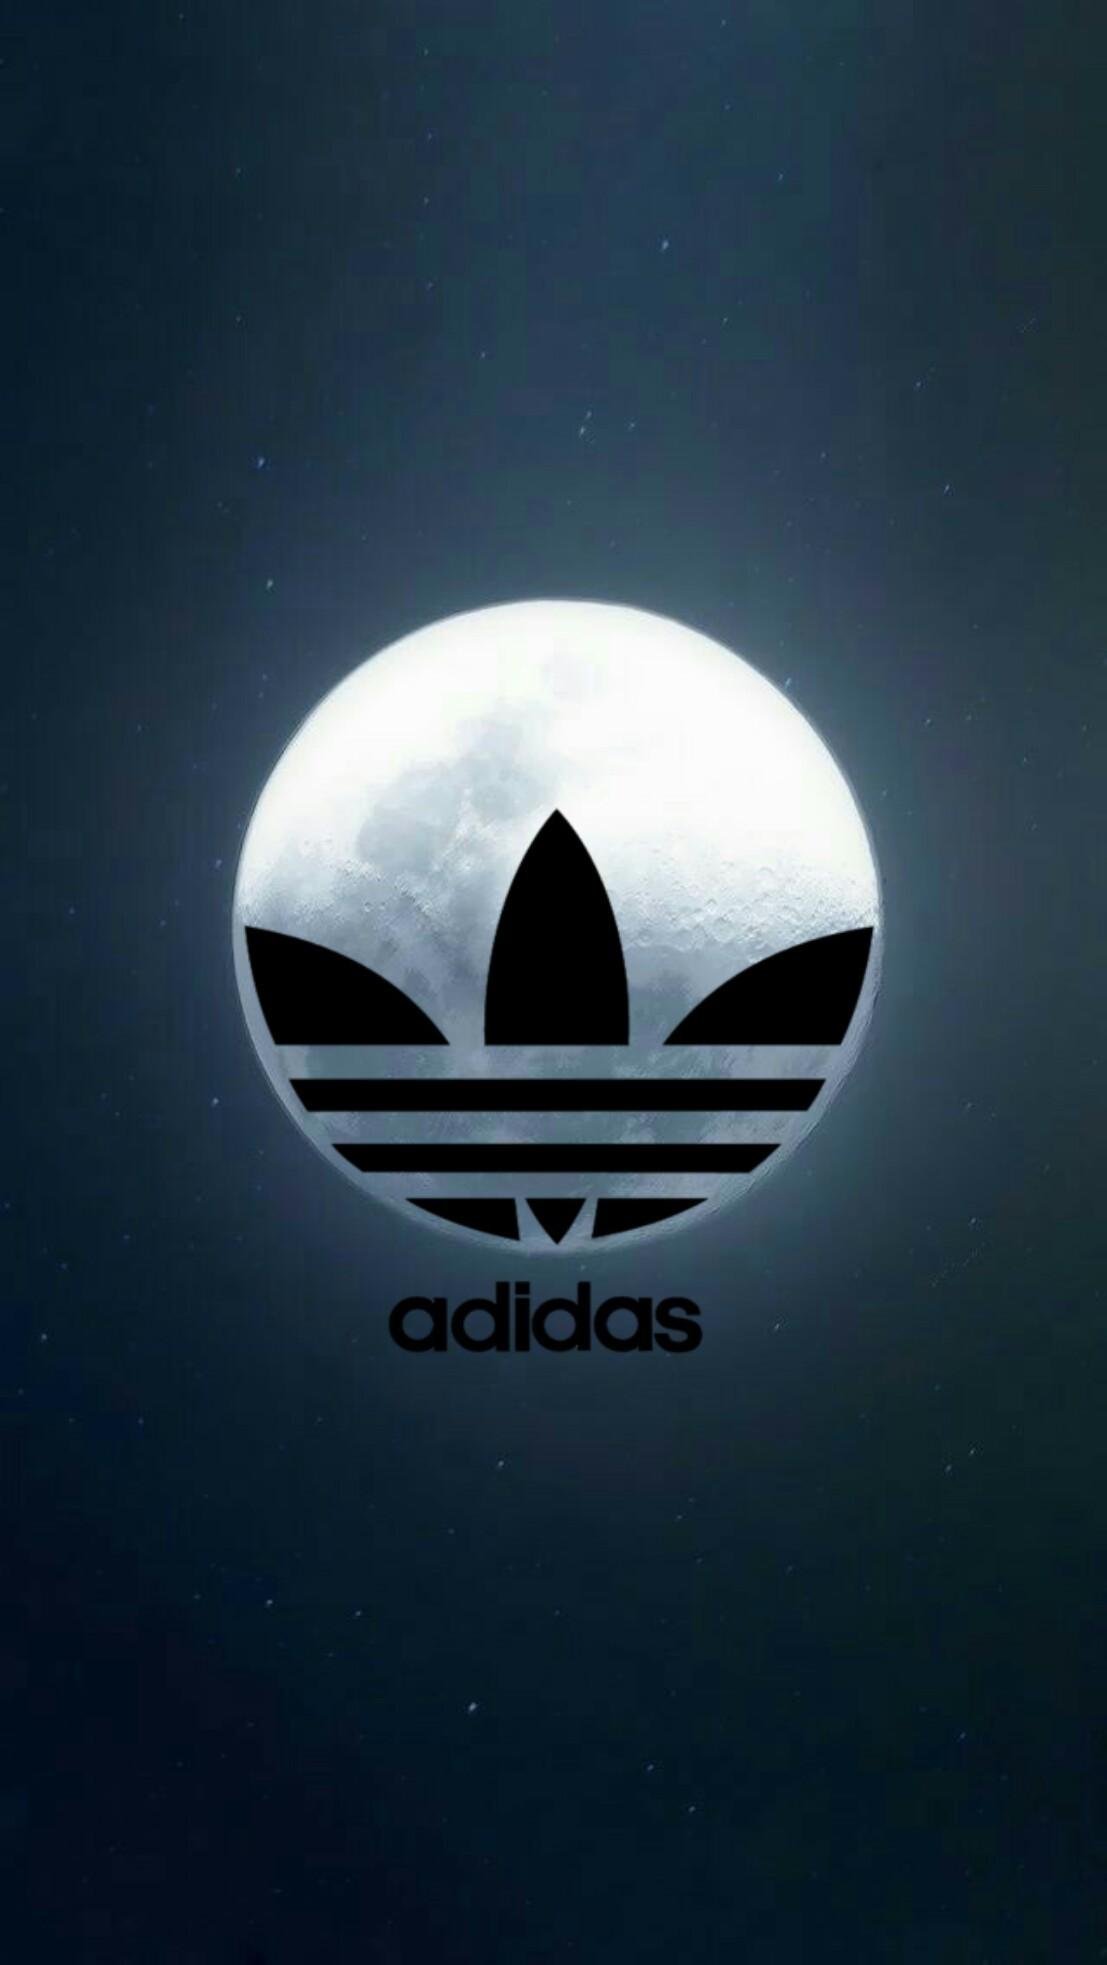 Adidas Black Wallpaper Hd 1107x1965 Download Hd Wallpaper